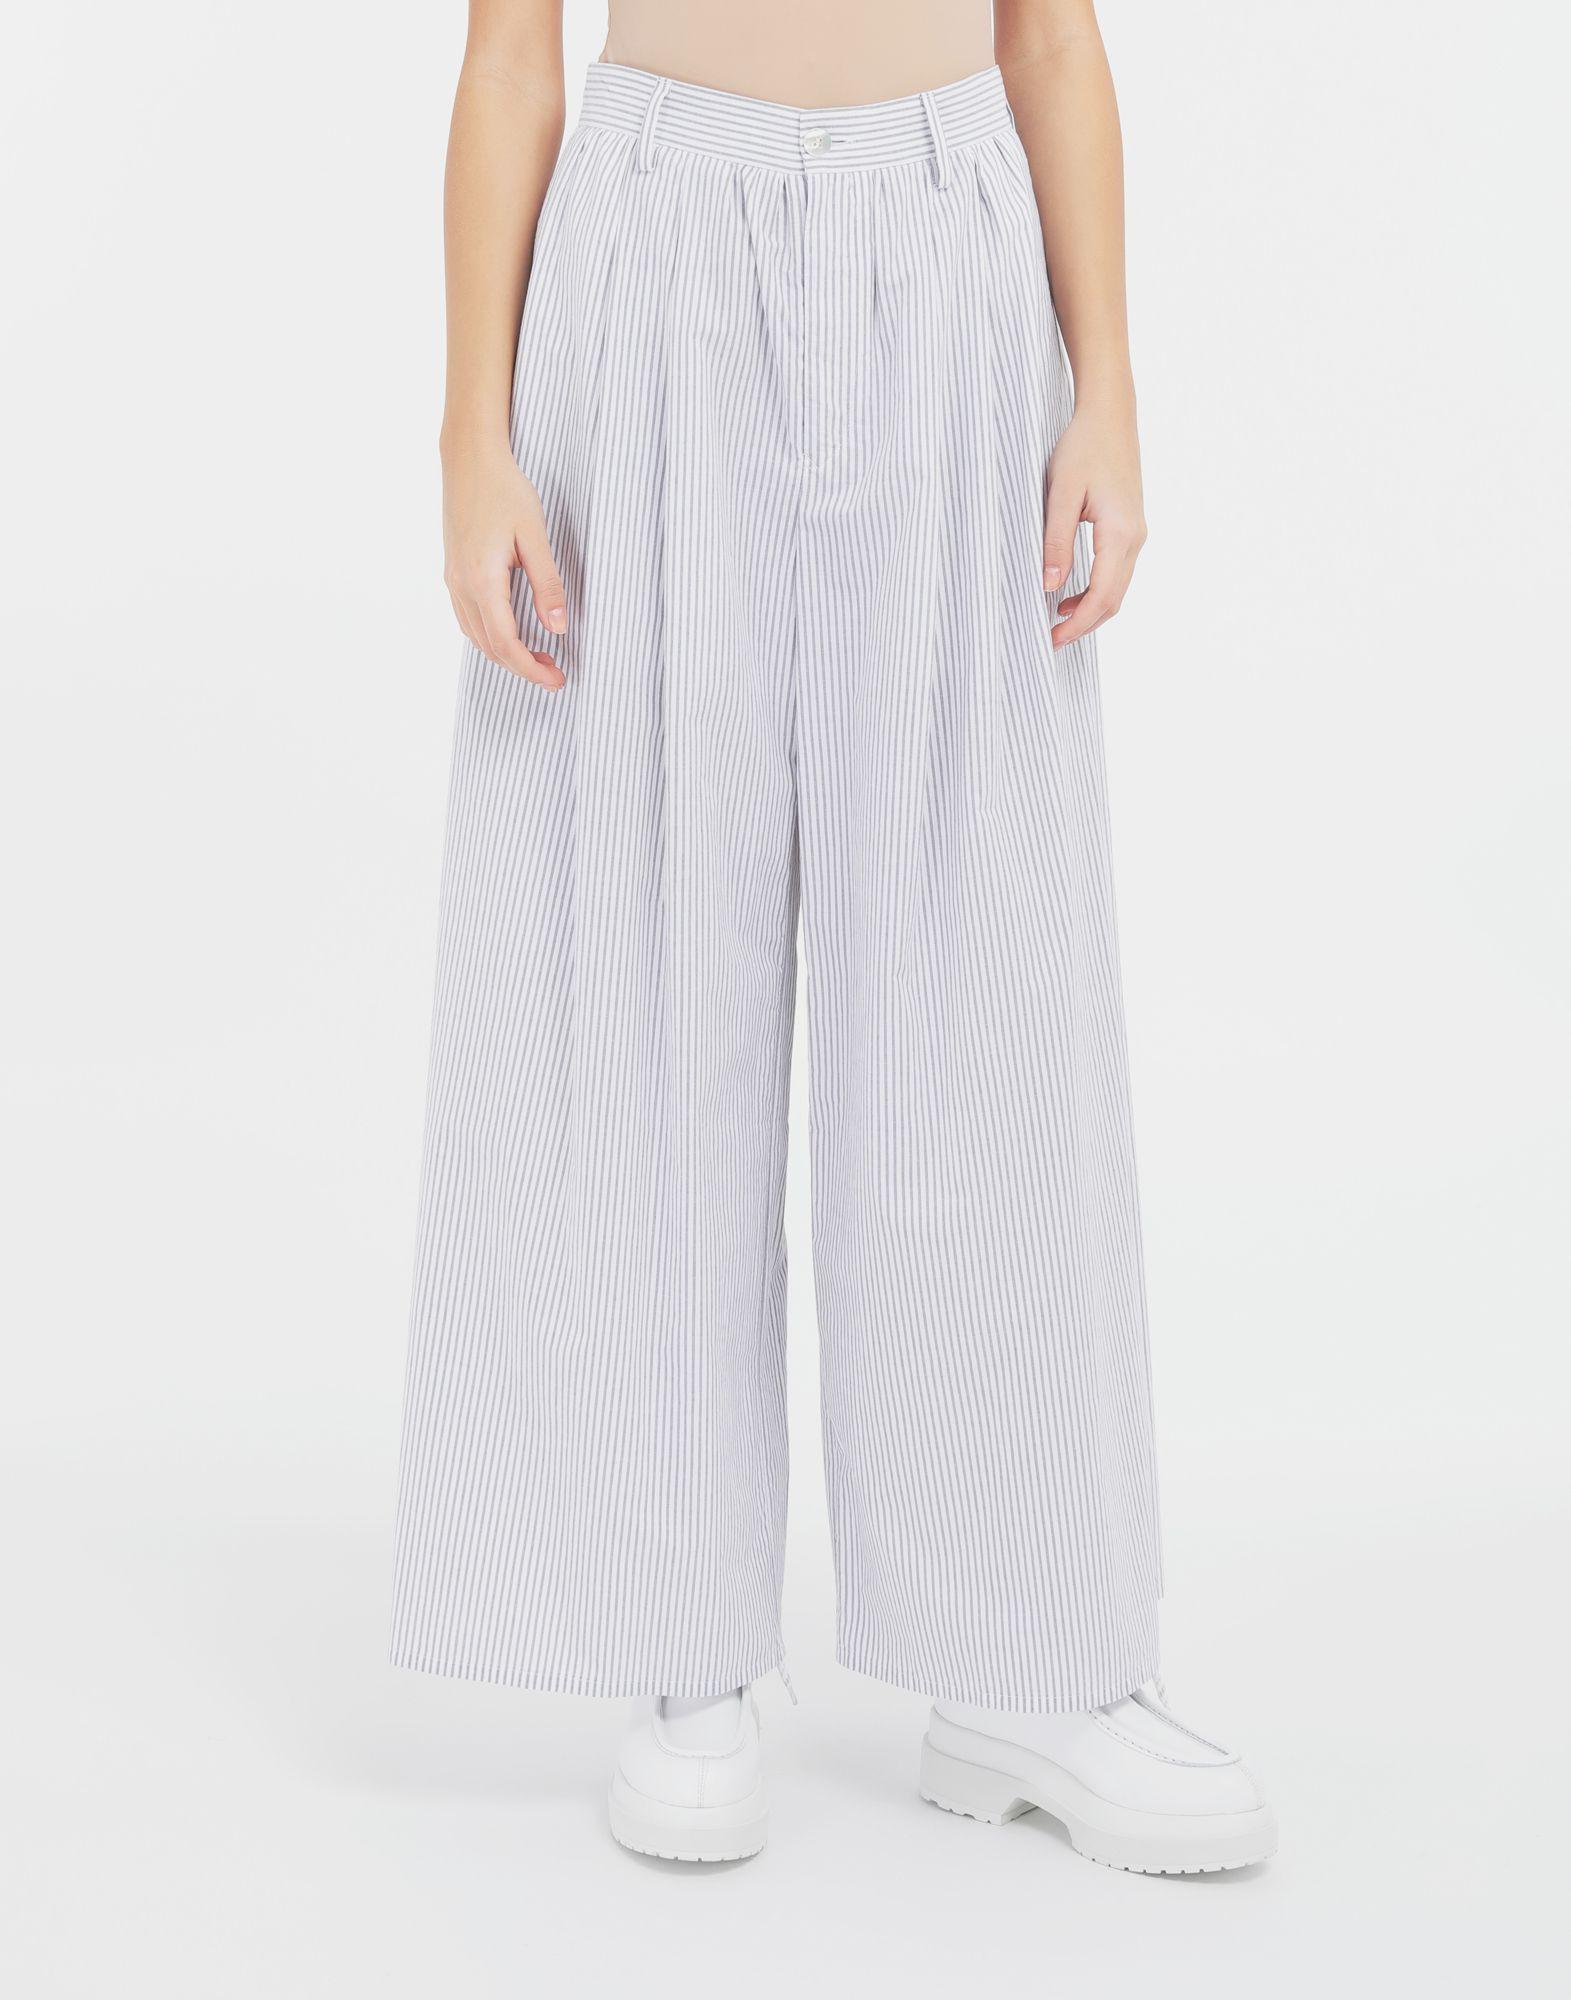 MM6 MAISON MARGIELA Flared striped cotton pants Trousers Woman r